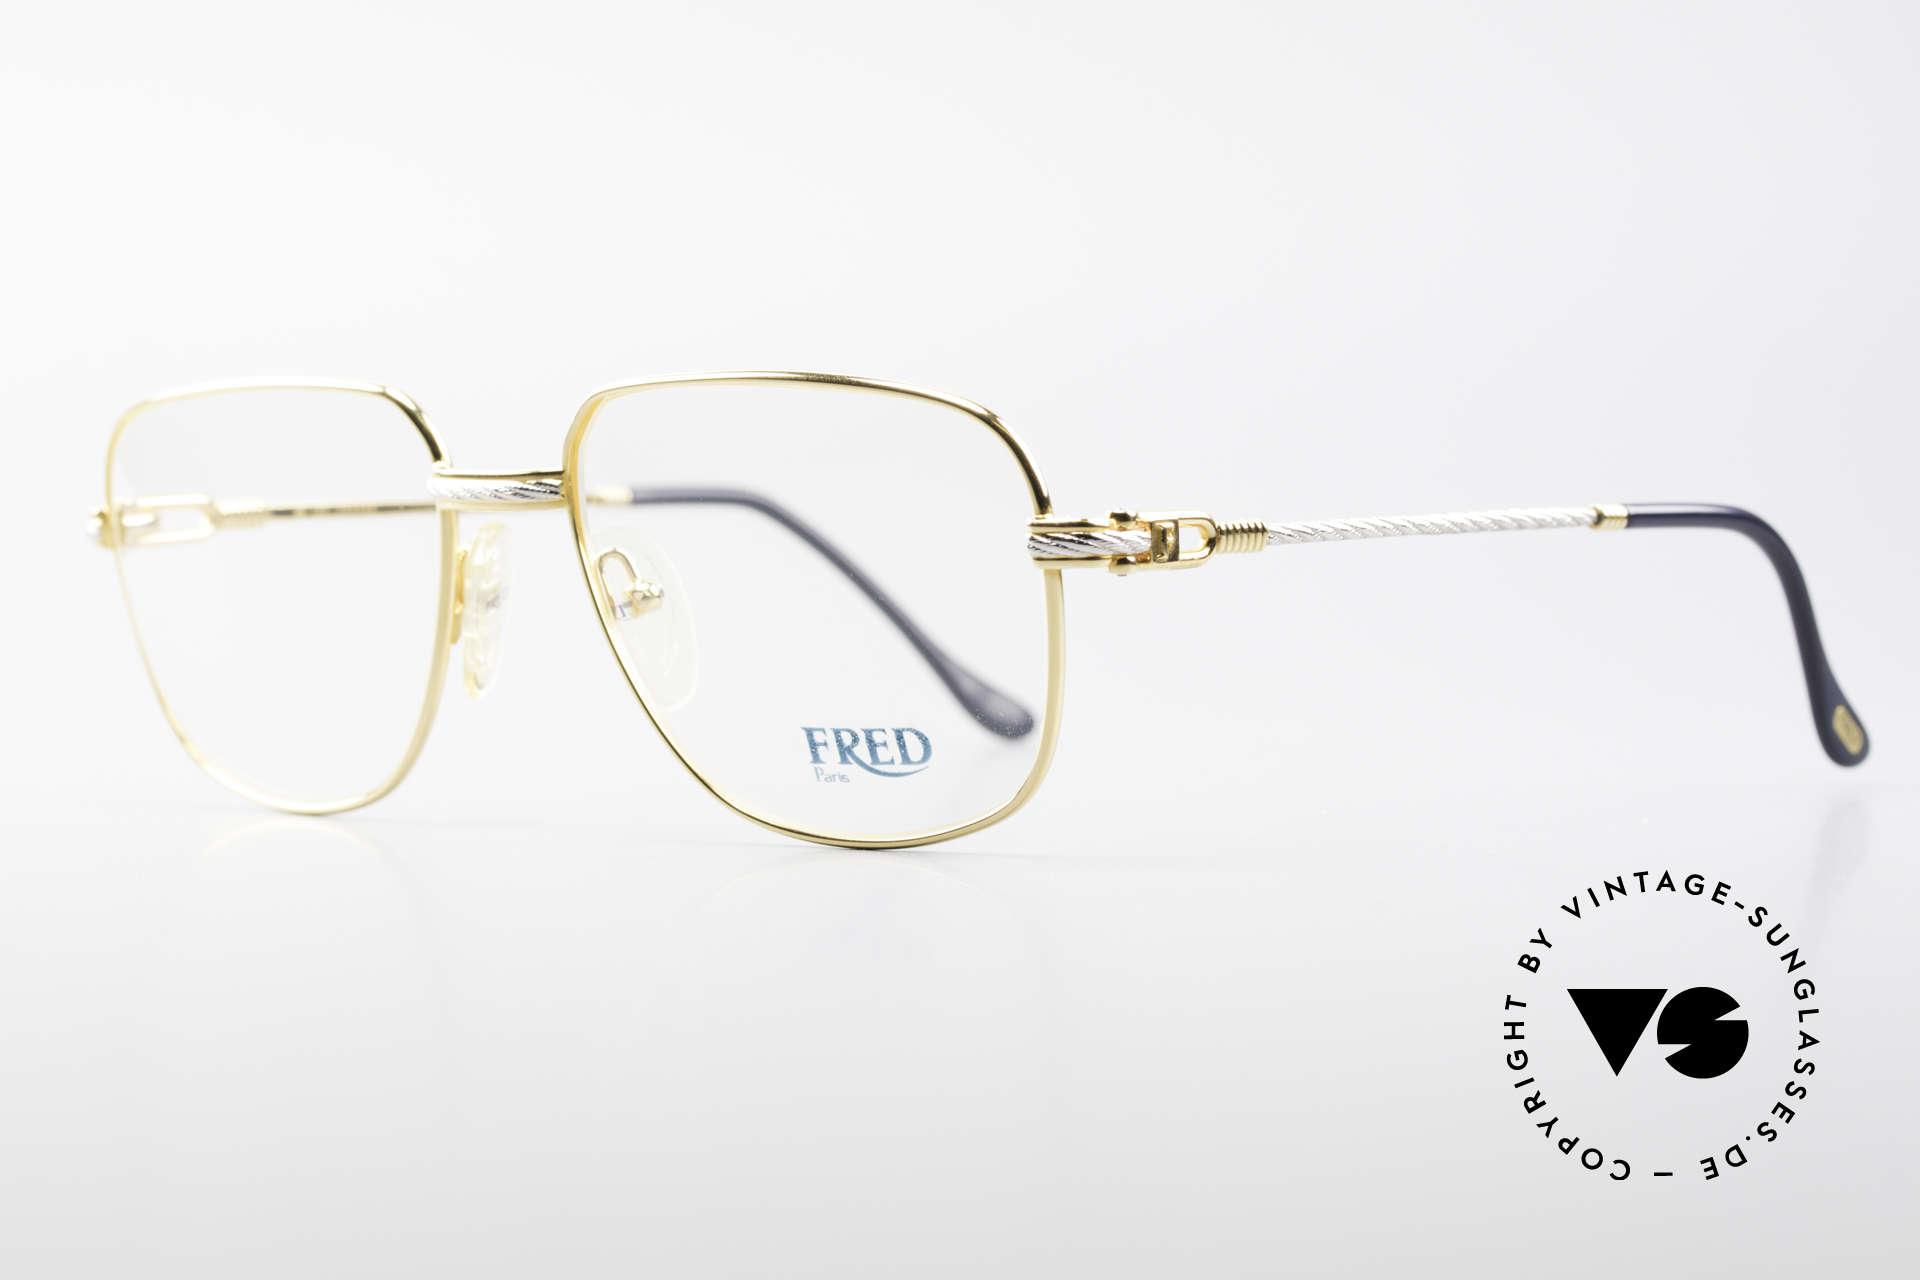 Fred Zephir Luxus Segler Brille Herren, der Name sagt alles: 'ZEPHIR' = griechischer Windgott, Passend für Herren